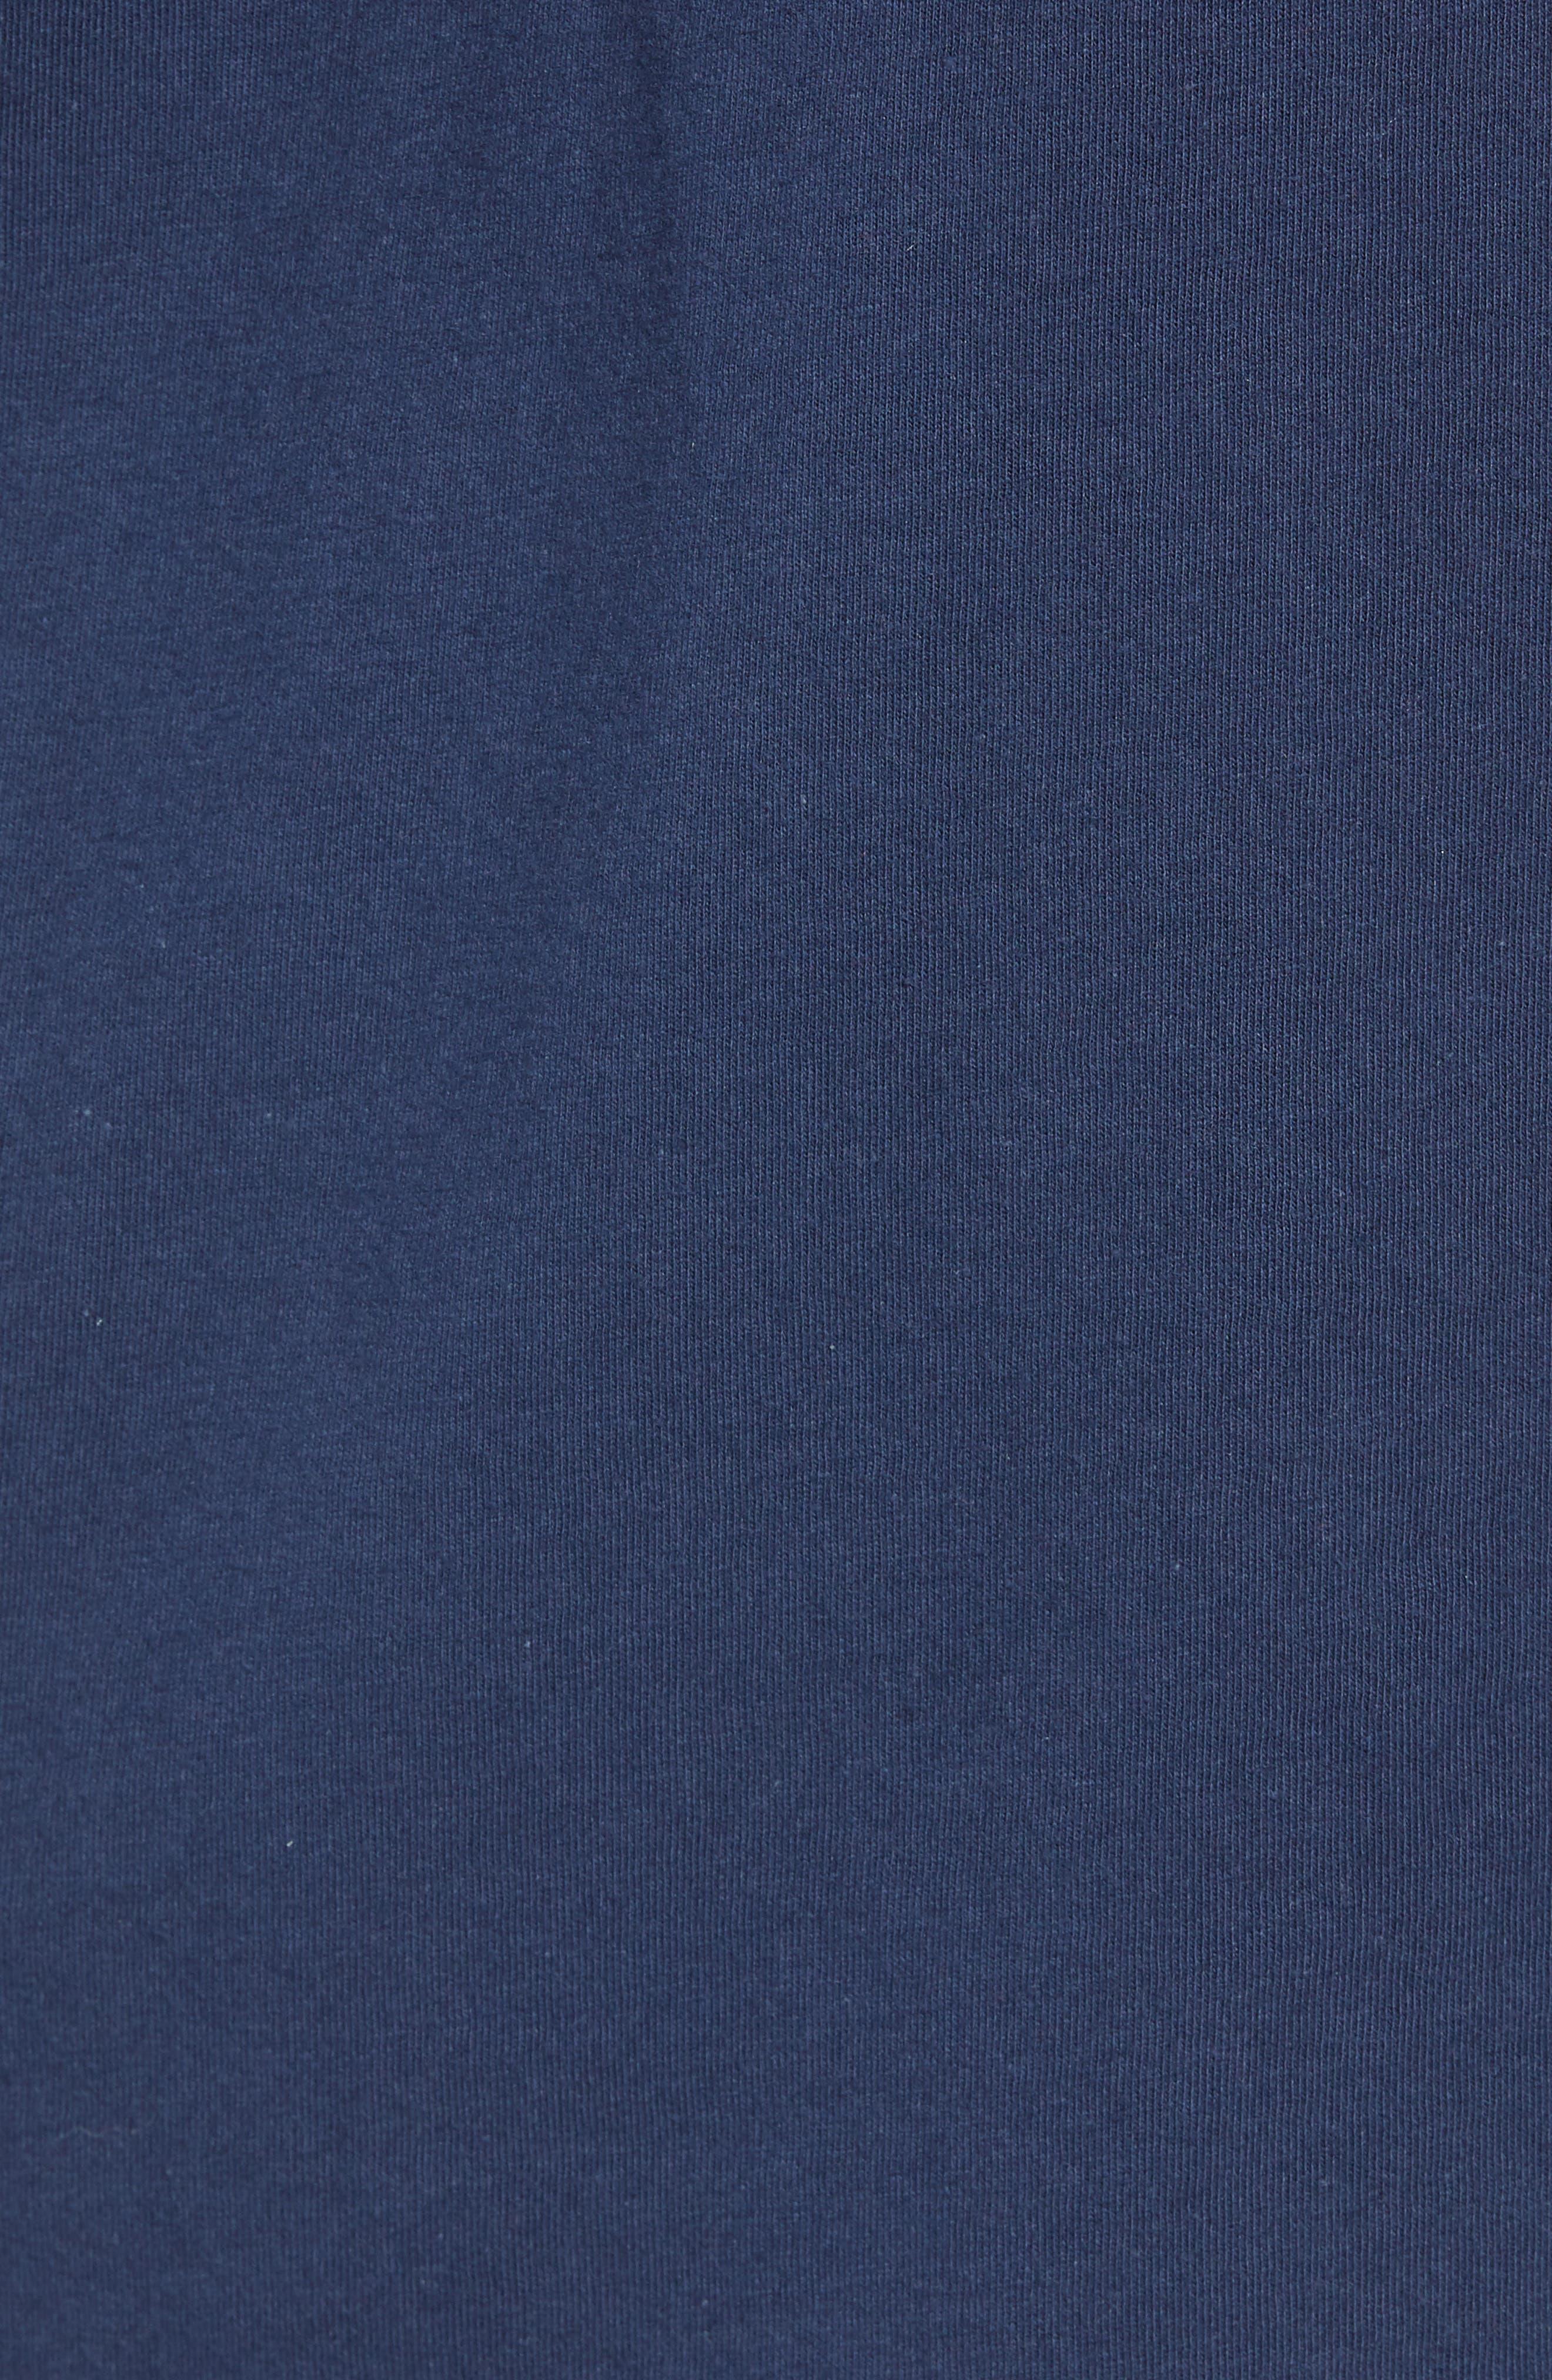 x Marvel<sup>®</sup> Black Panther T-Shirt,                             Alternate thumbnail 5, color,                             Dress Blues